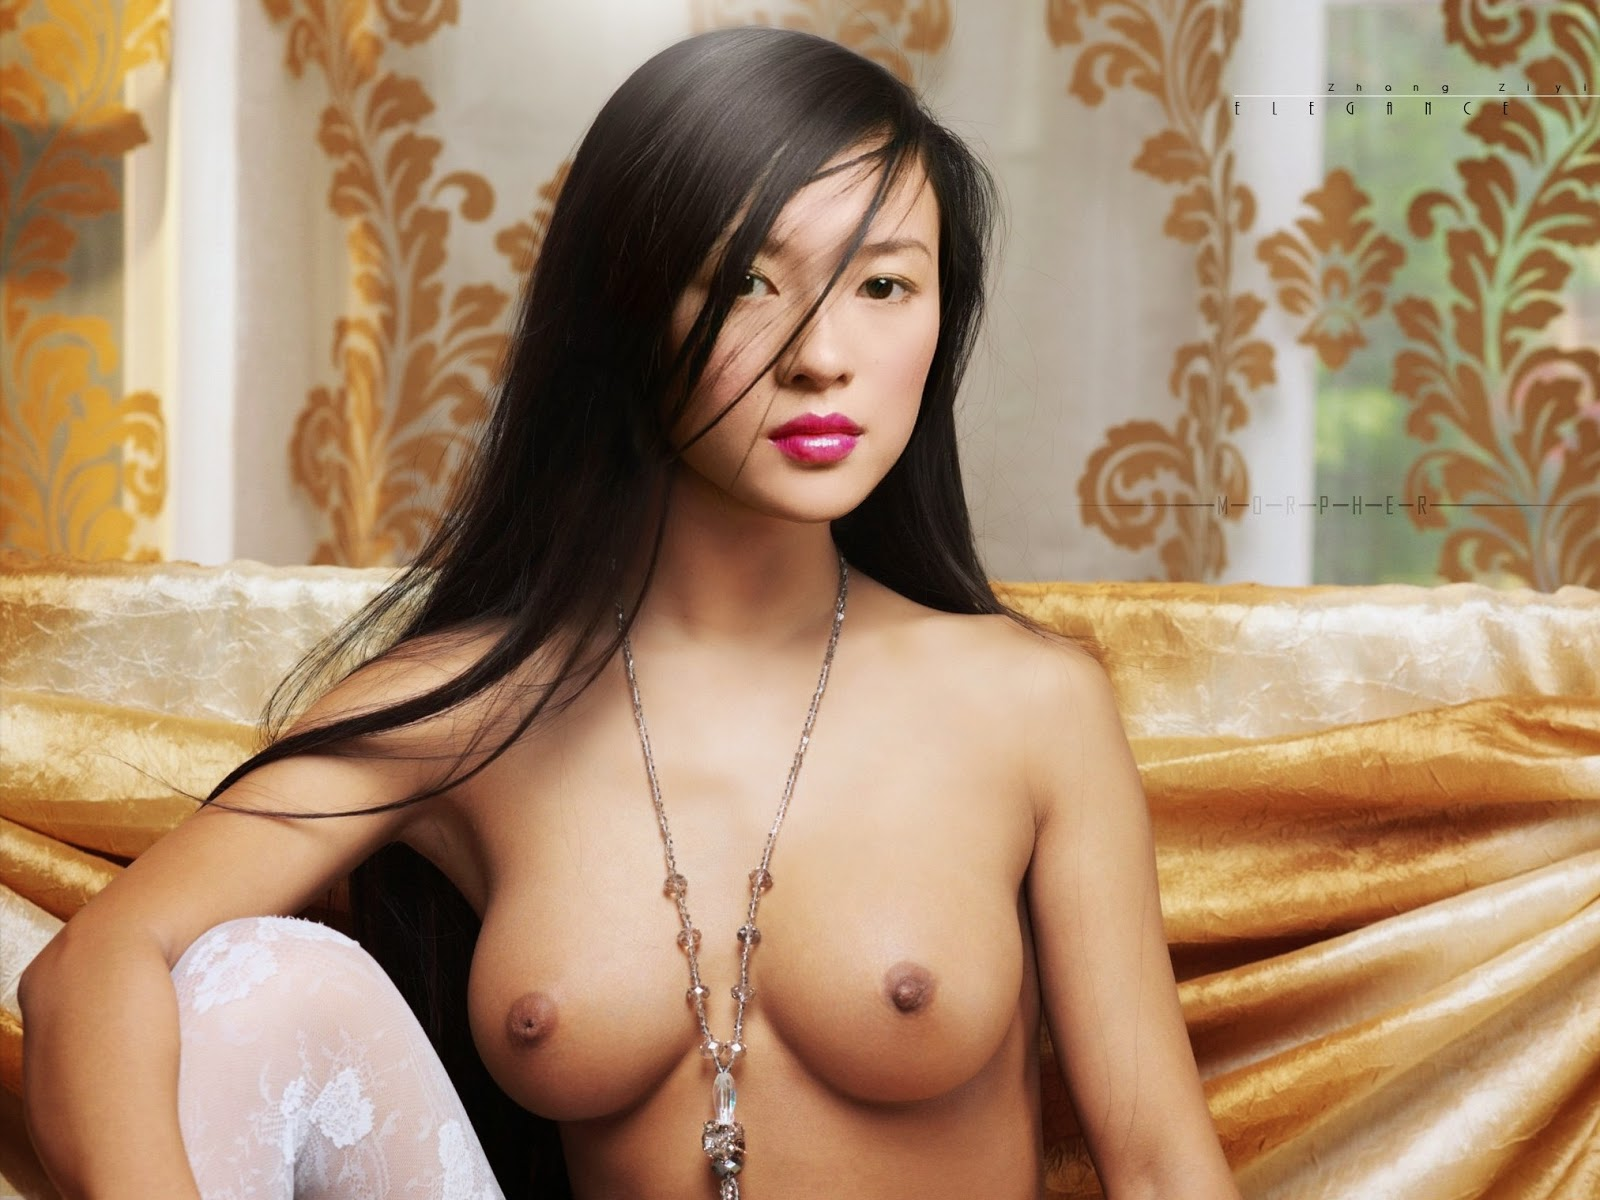 German Hot Pussy Pics  C2 B7 Naked Sexy Chinese Actress